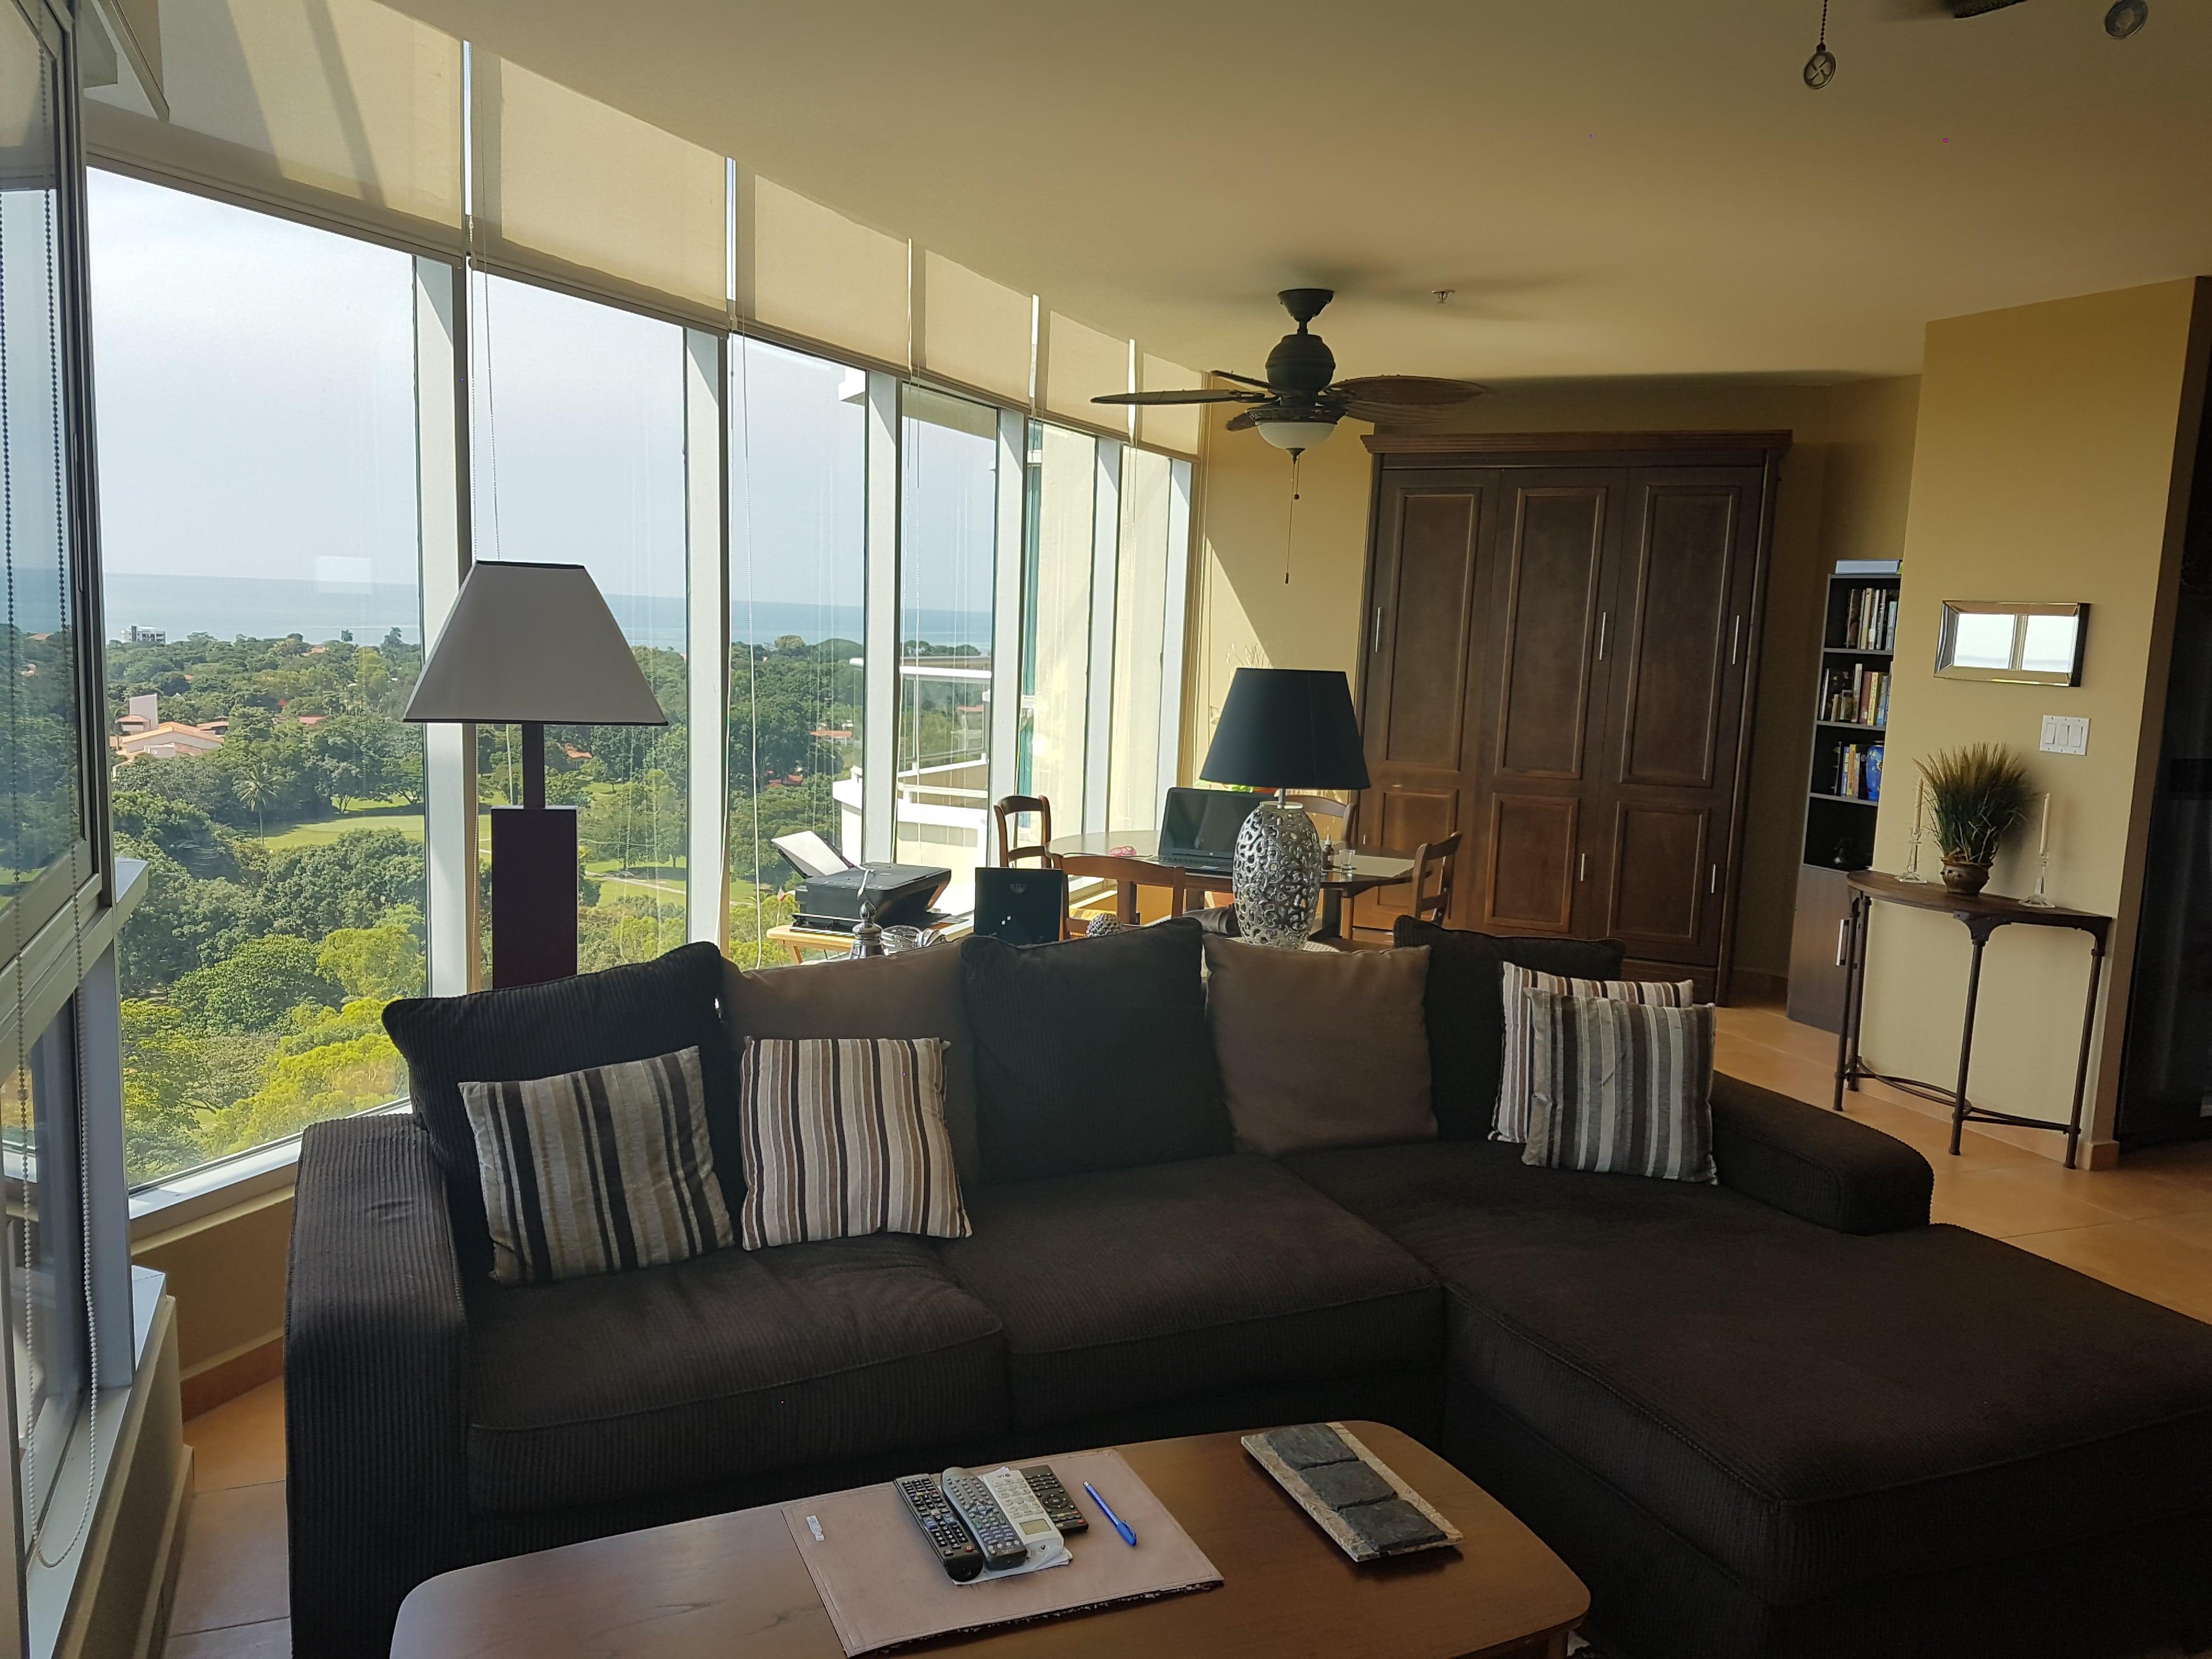 Coronado Lifestyle with Great Views